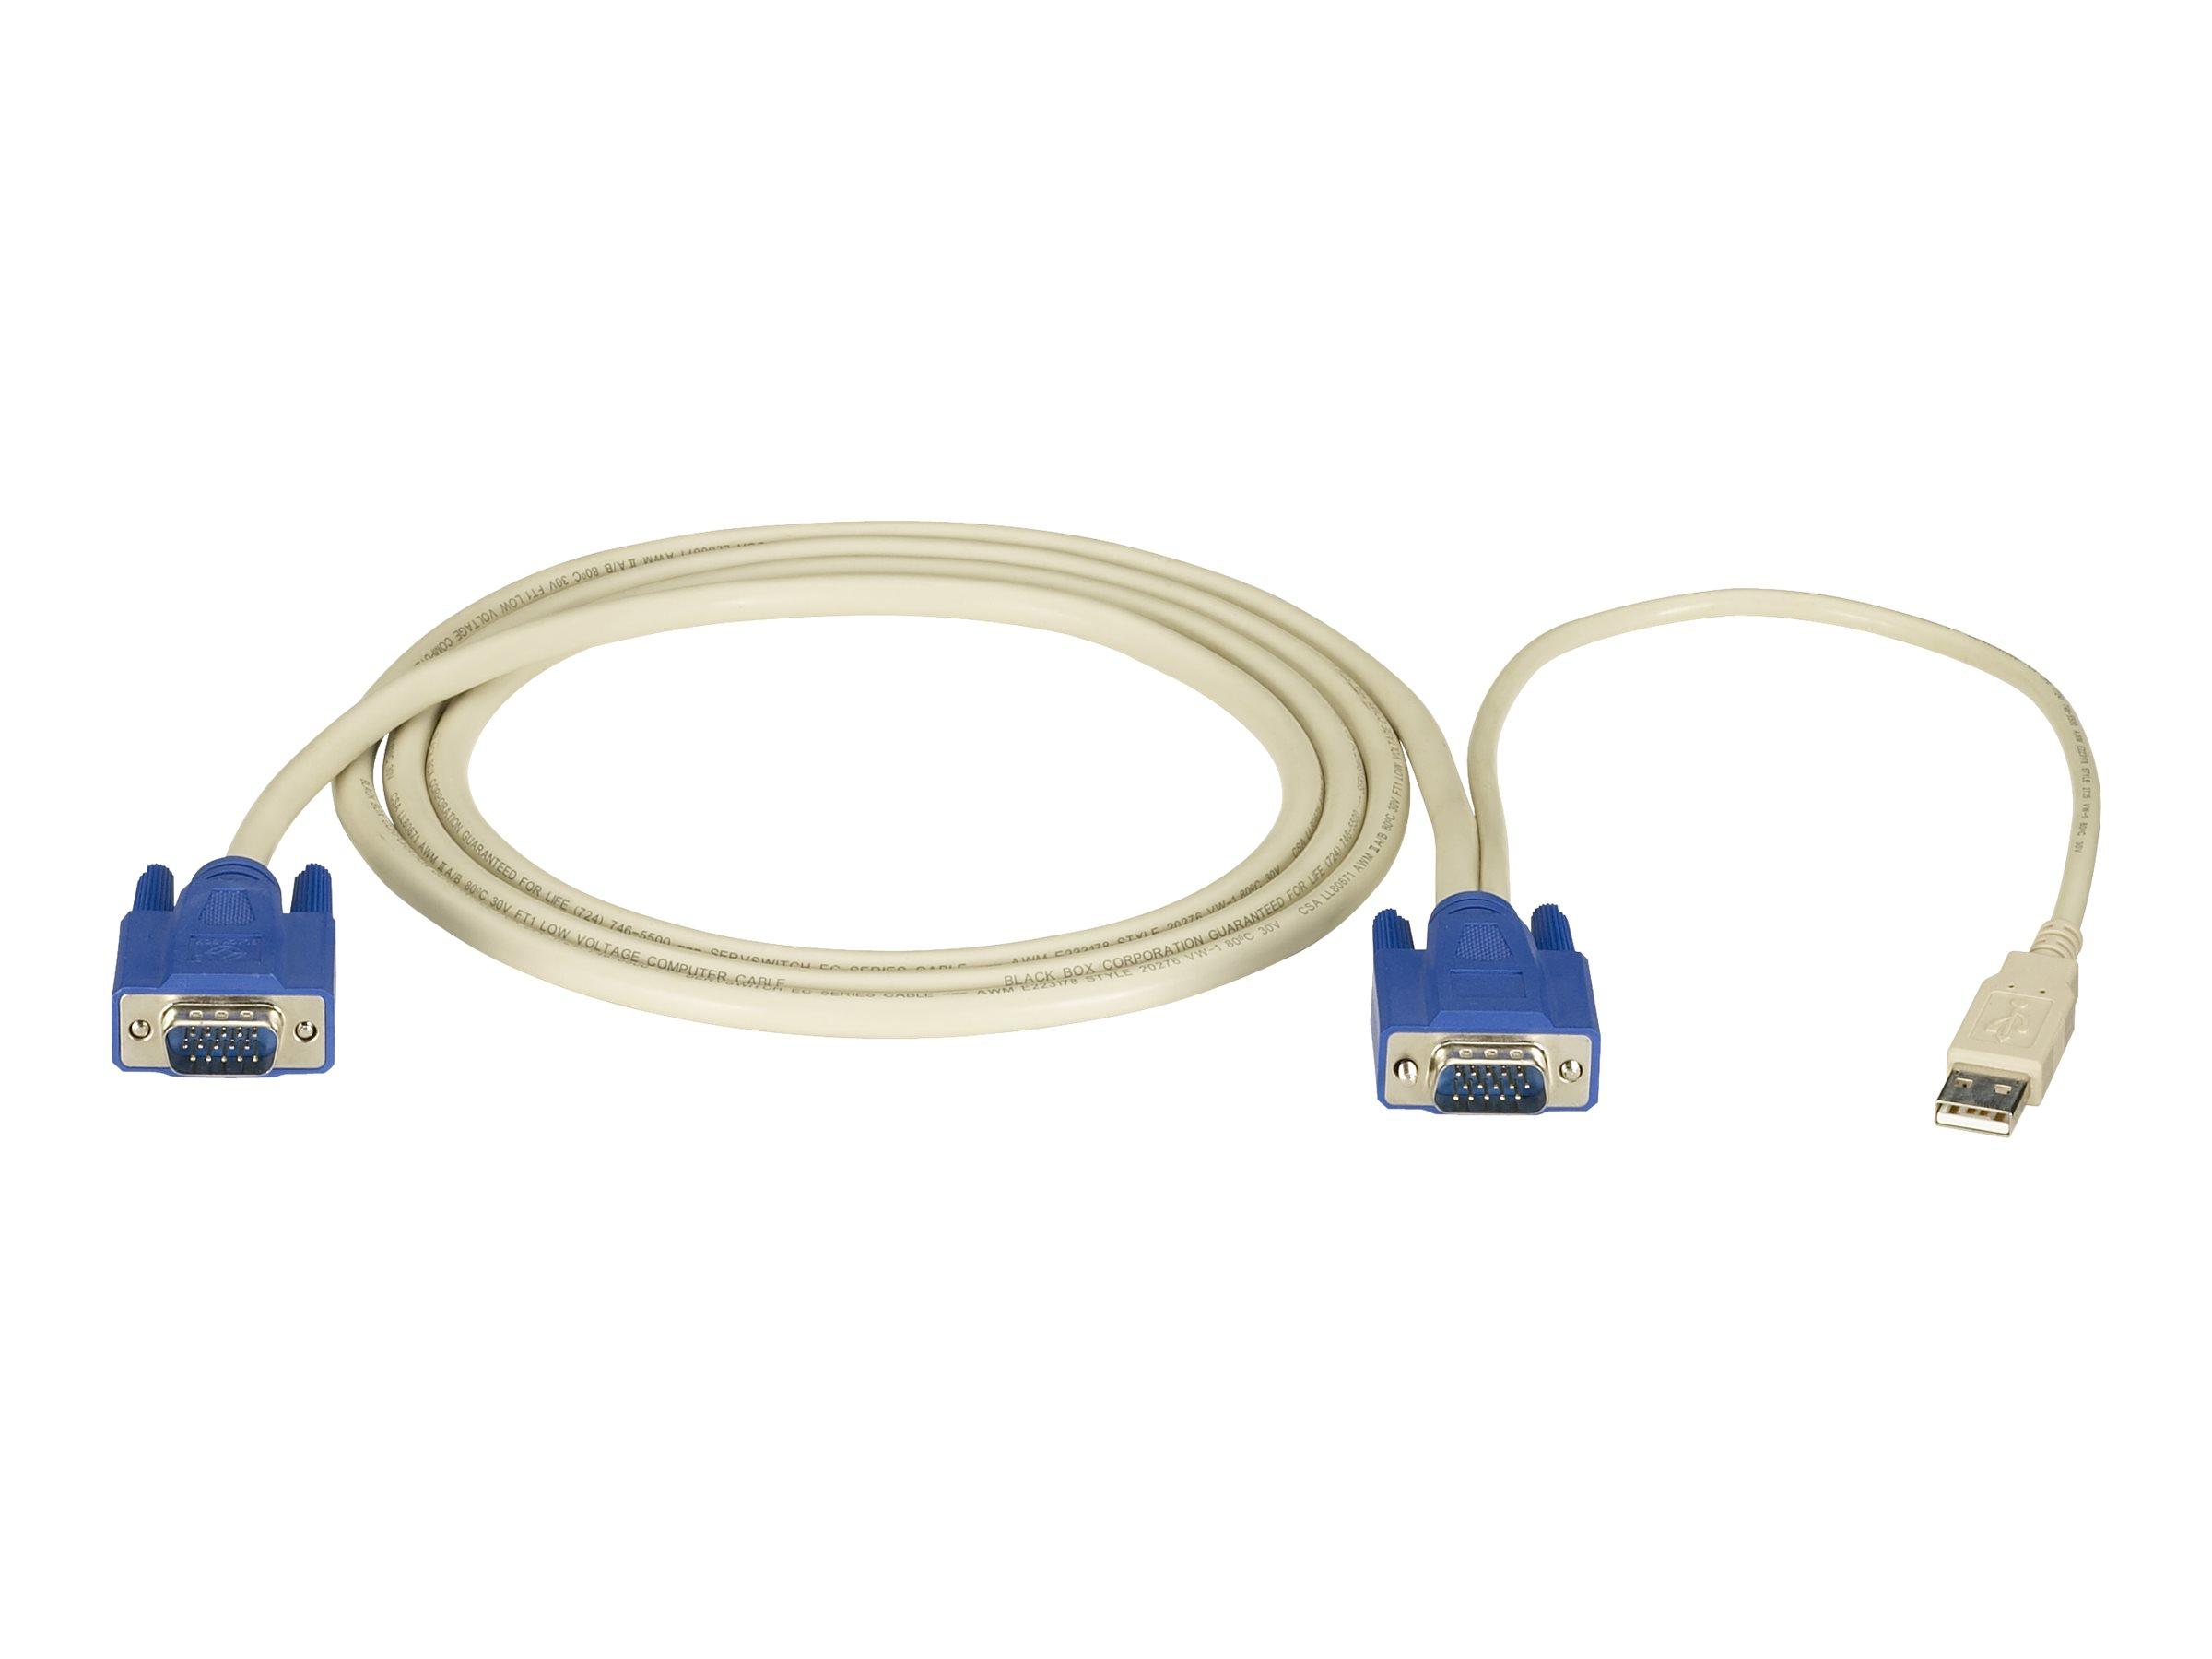 Black Box ServSwitch Server Cable - Tastatur- / Video- / Maus- (KVM-) Kabel - HD-15 (VGA) (M) bis USB, HD-15 (VGA) (M) - 1.8 m -